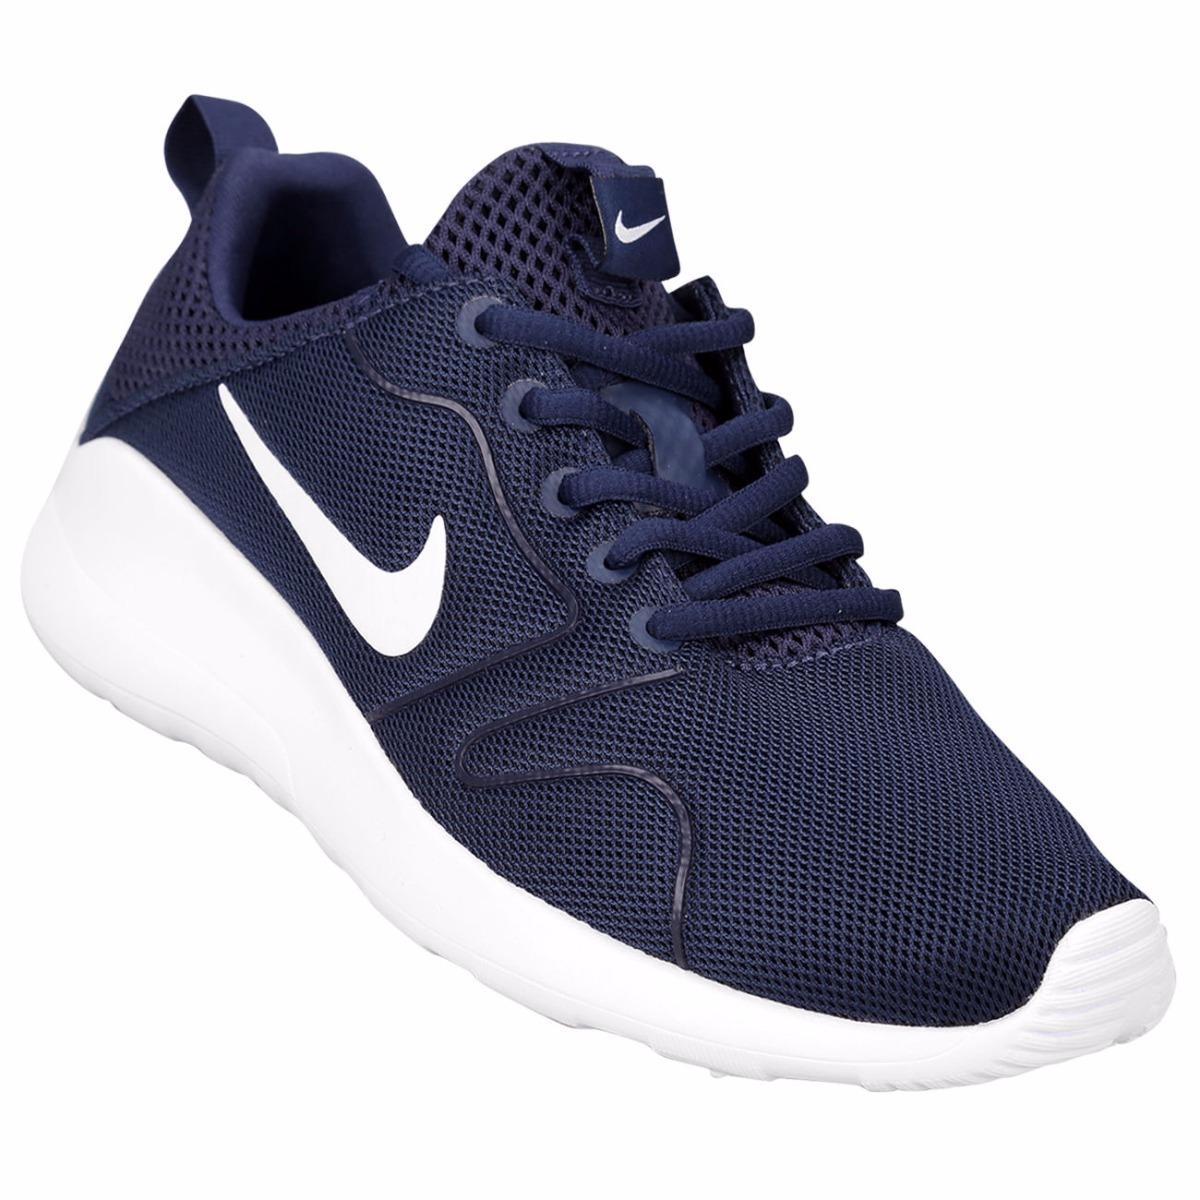 4e4e10ed6af Zapatillas Nike Kaishi 2.0 - Azul - Mujer - Originales -   3.864